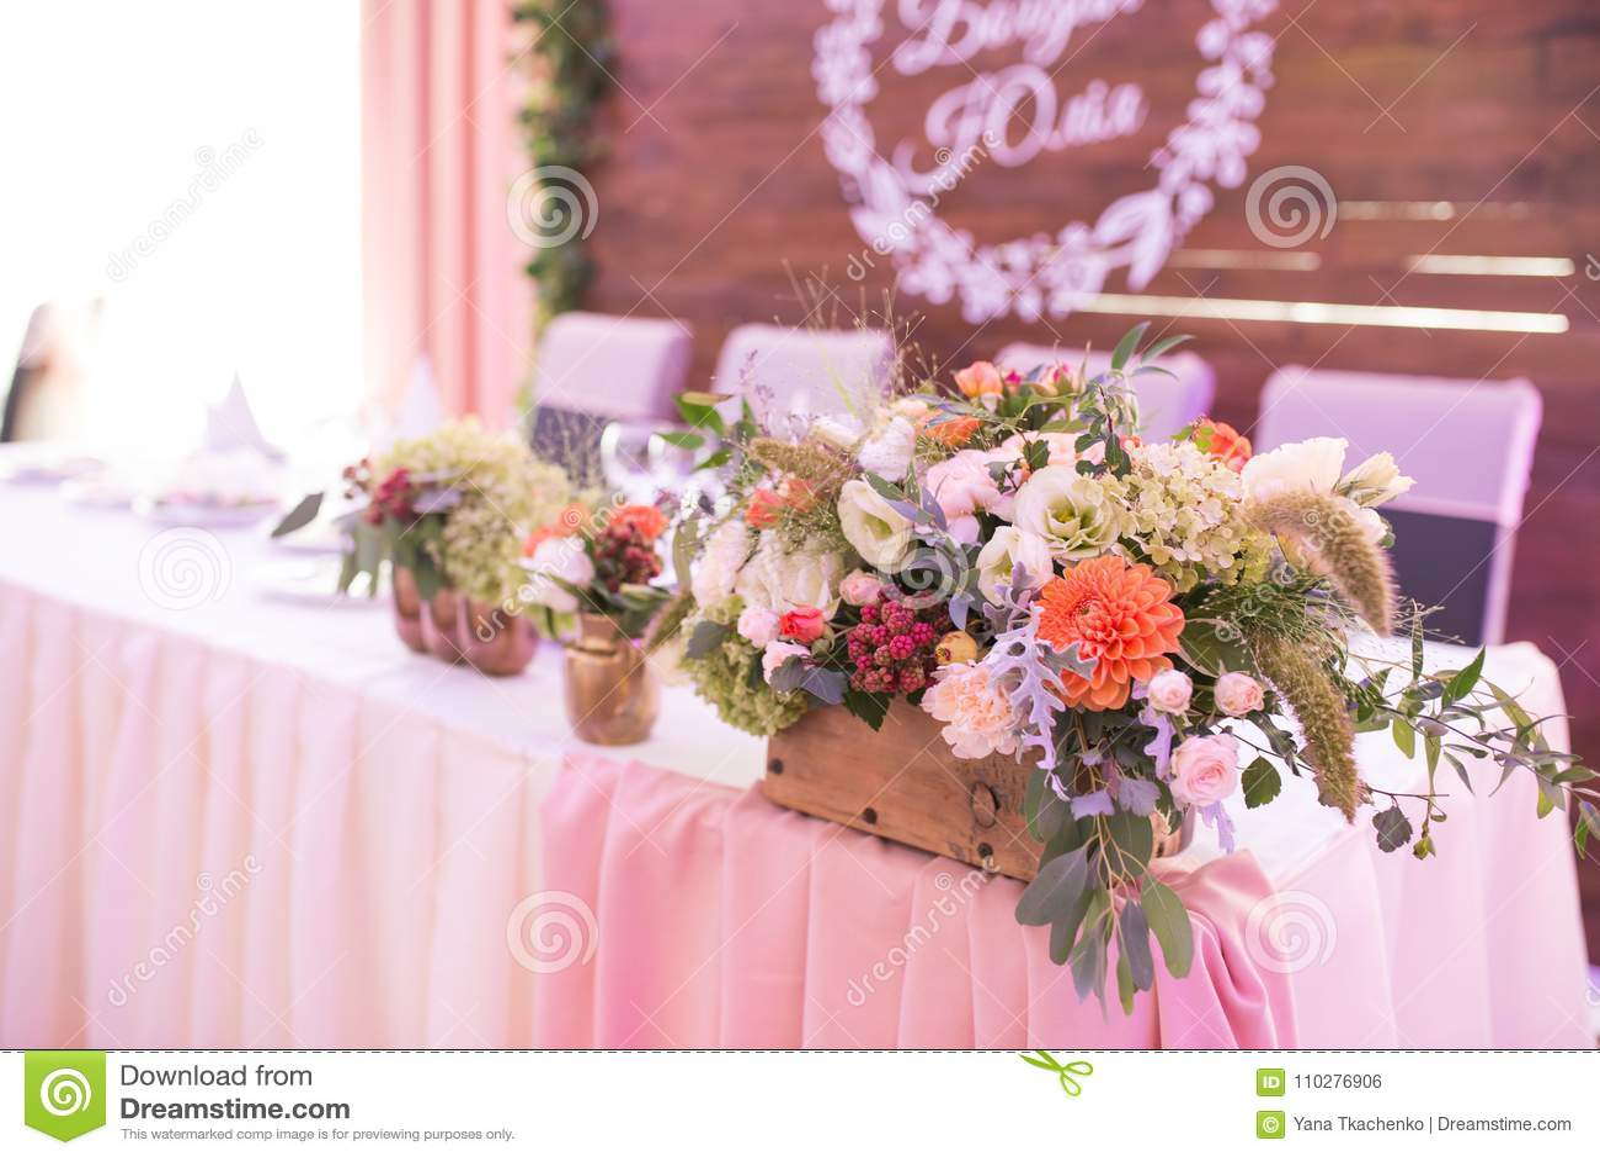 Rustic Flower Arrangement At A Wedding Banquet. Table Set For An ...